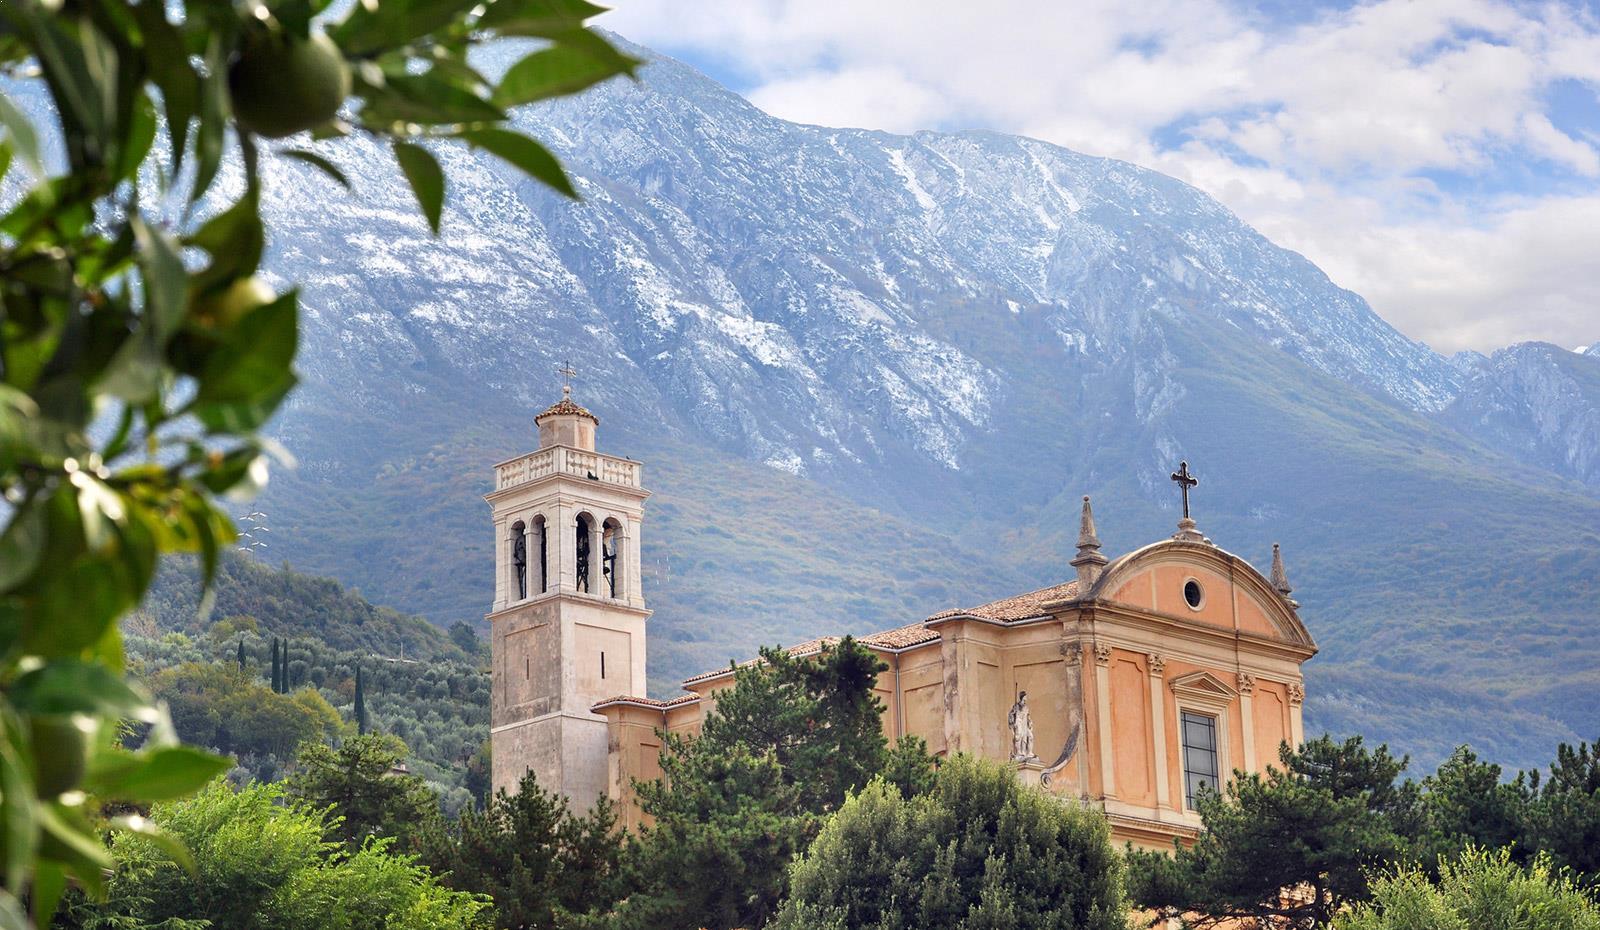 Italian Churces for Weddings in Gardalake